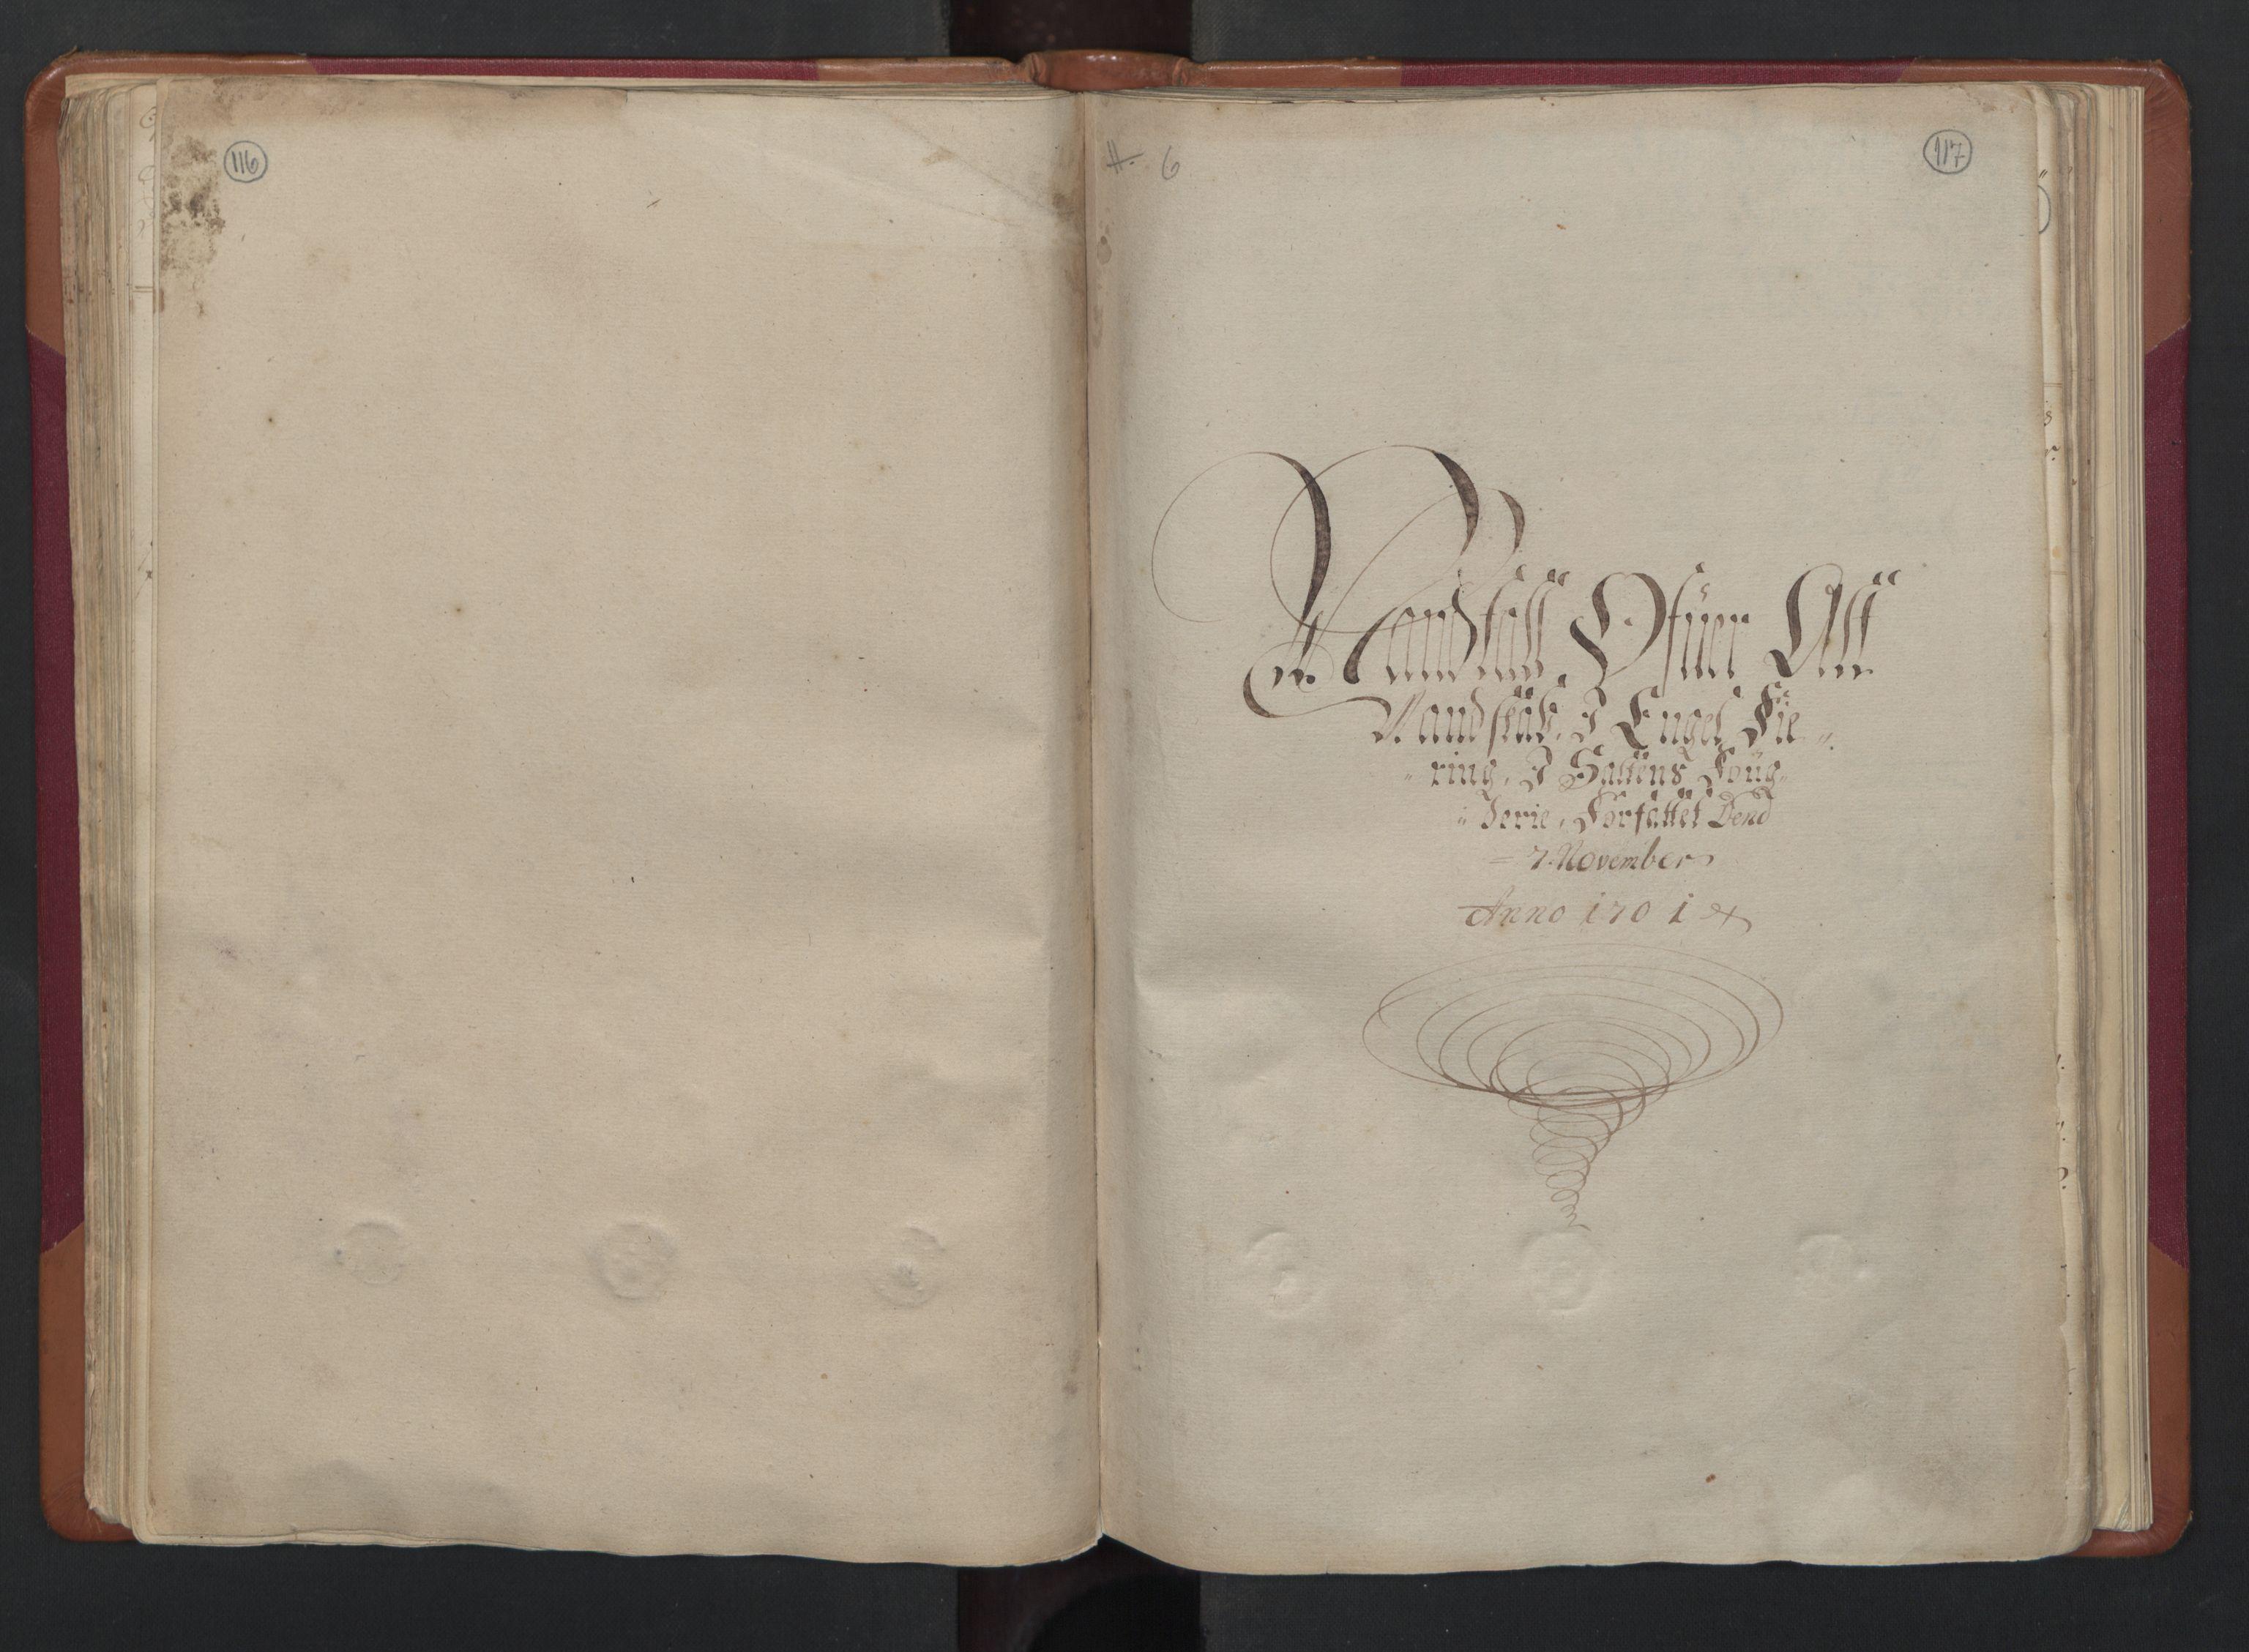 RA, Manntallet 1701, nr. 17: Salten fogderi, 1701, s. 116-117